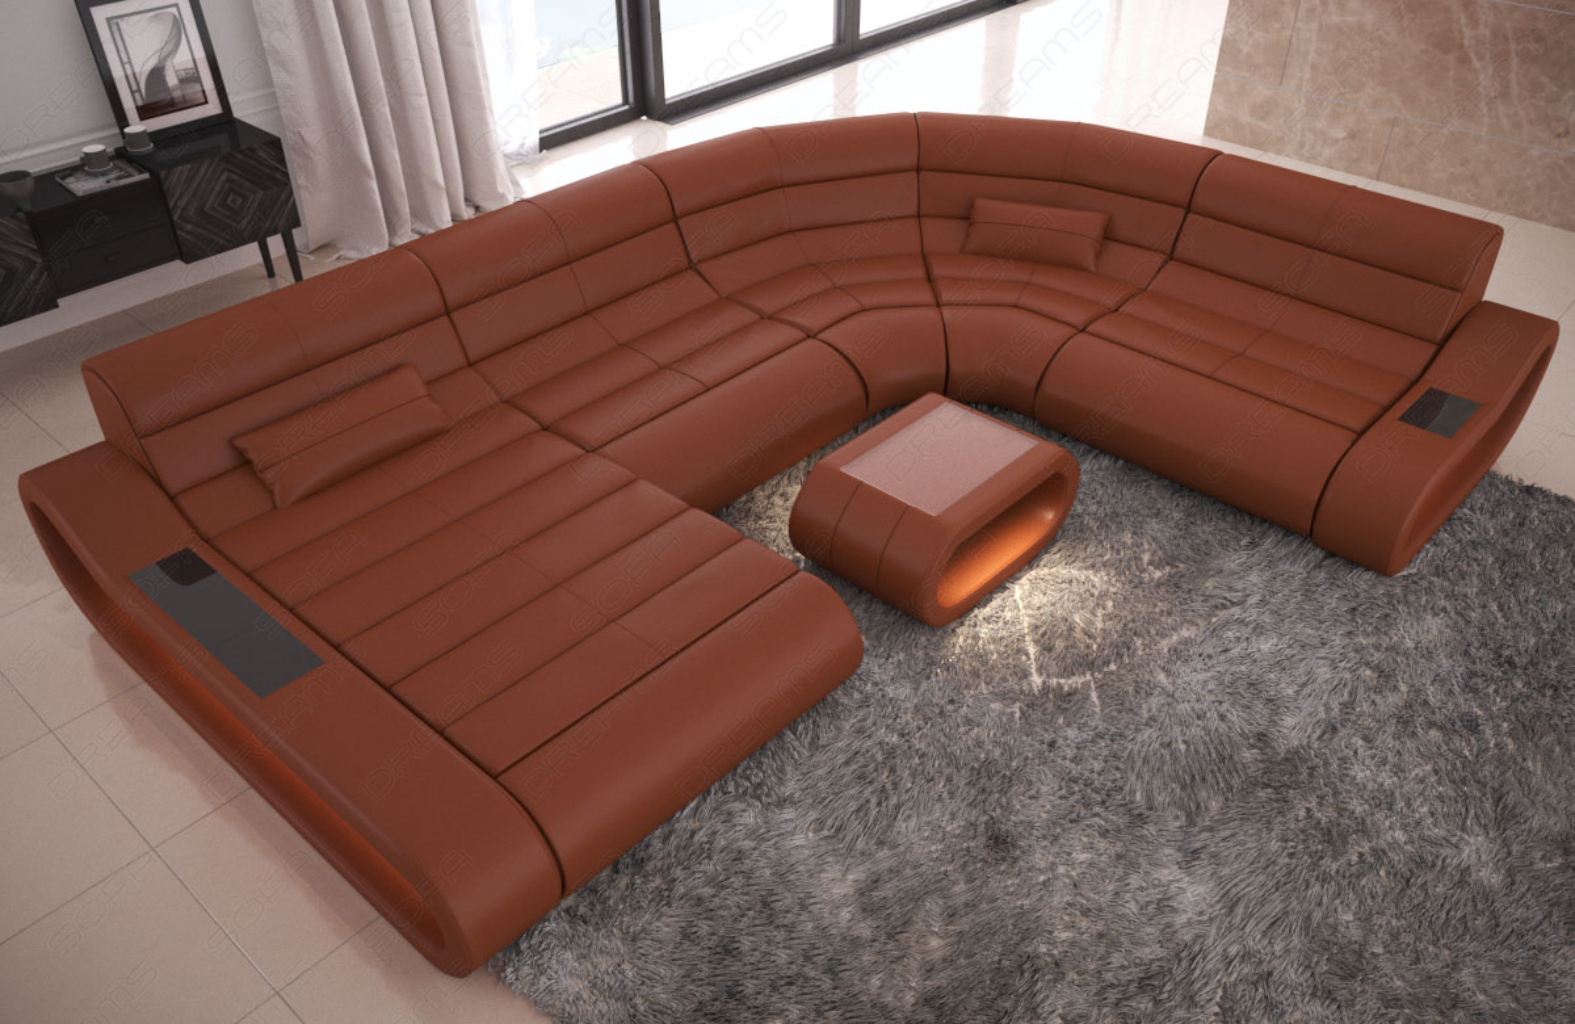 Sofa Couch XXL Echtleder Garnitur CONCEPT Ottomane Beleuchtung große ...